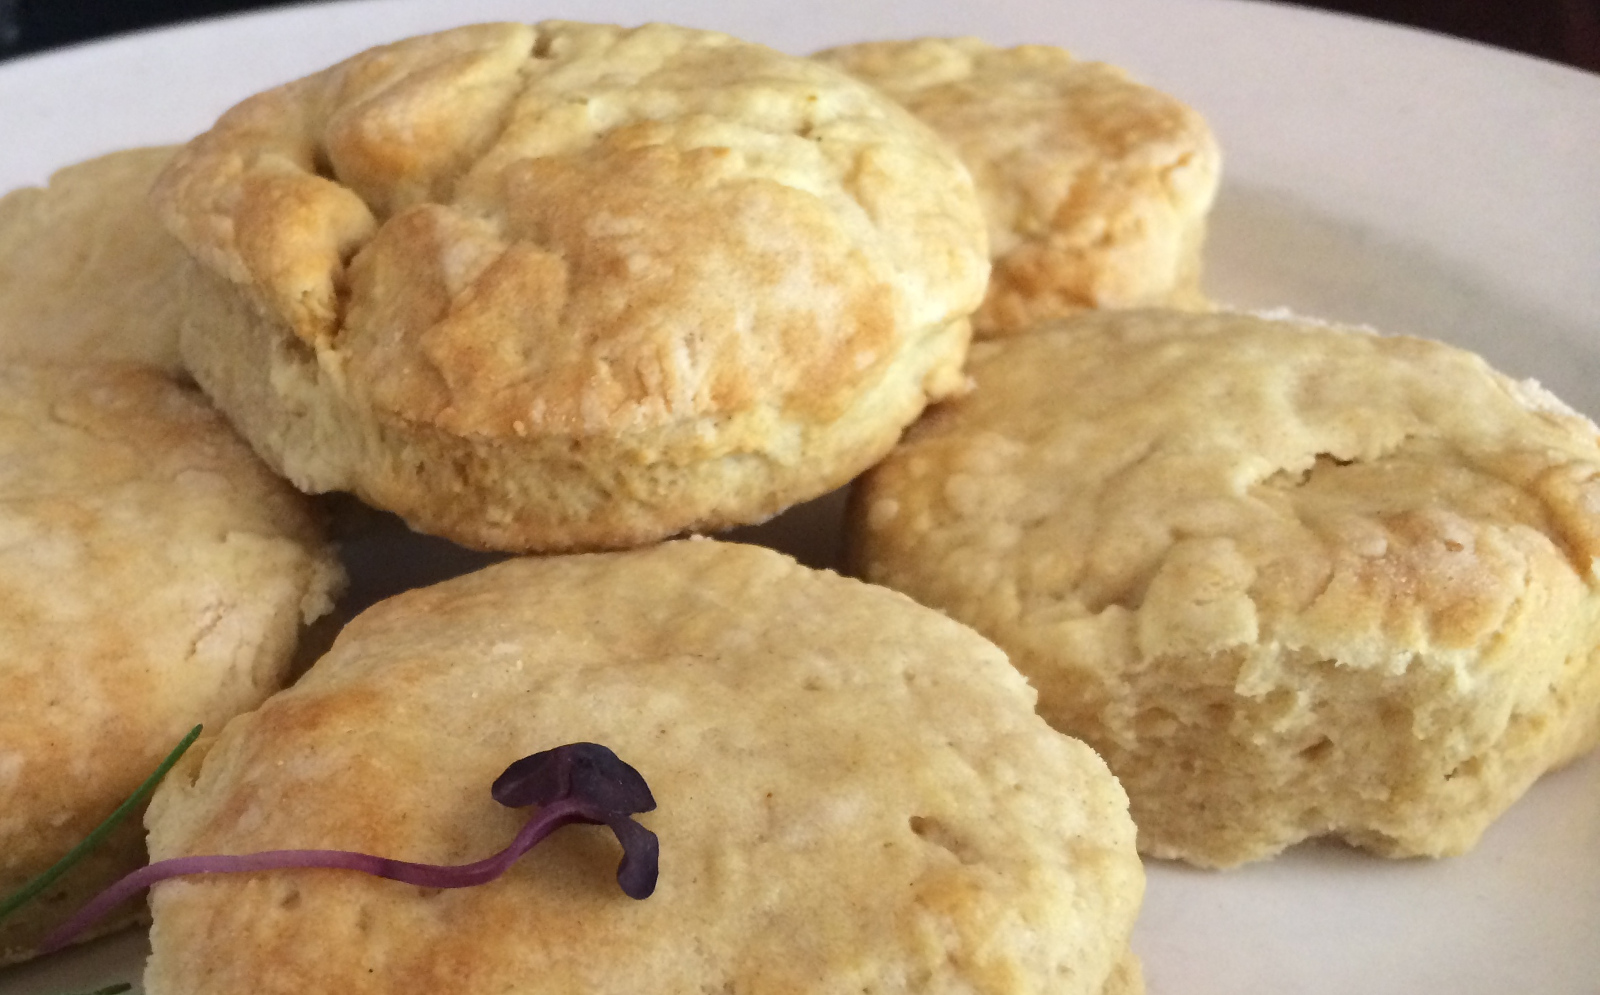 Rosemary 'Buttermilk' Biscuits [Vegan]